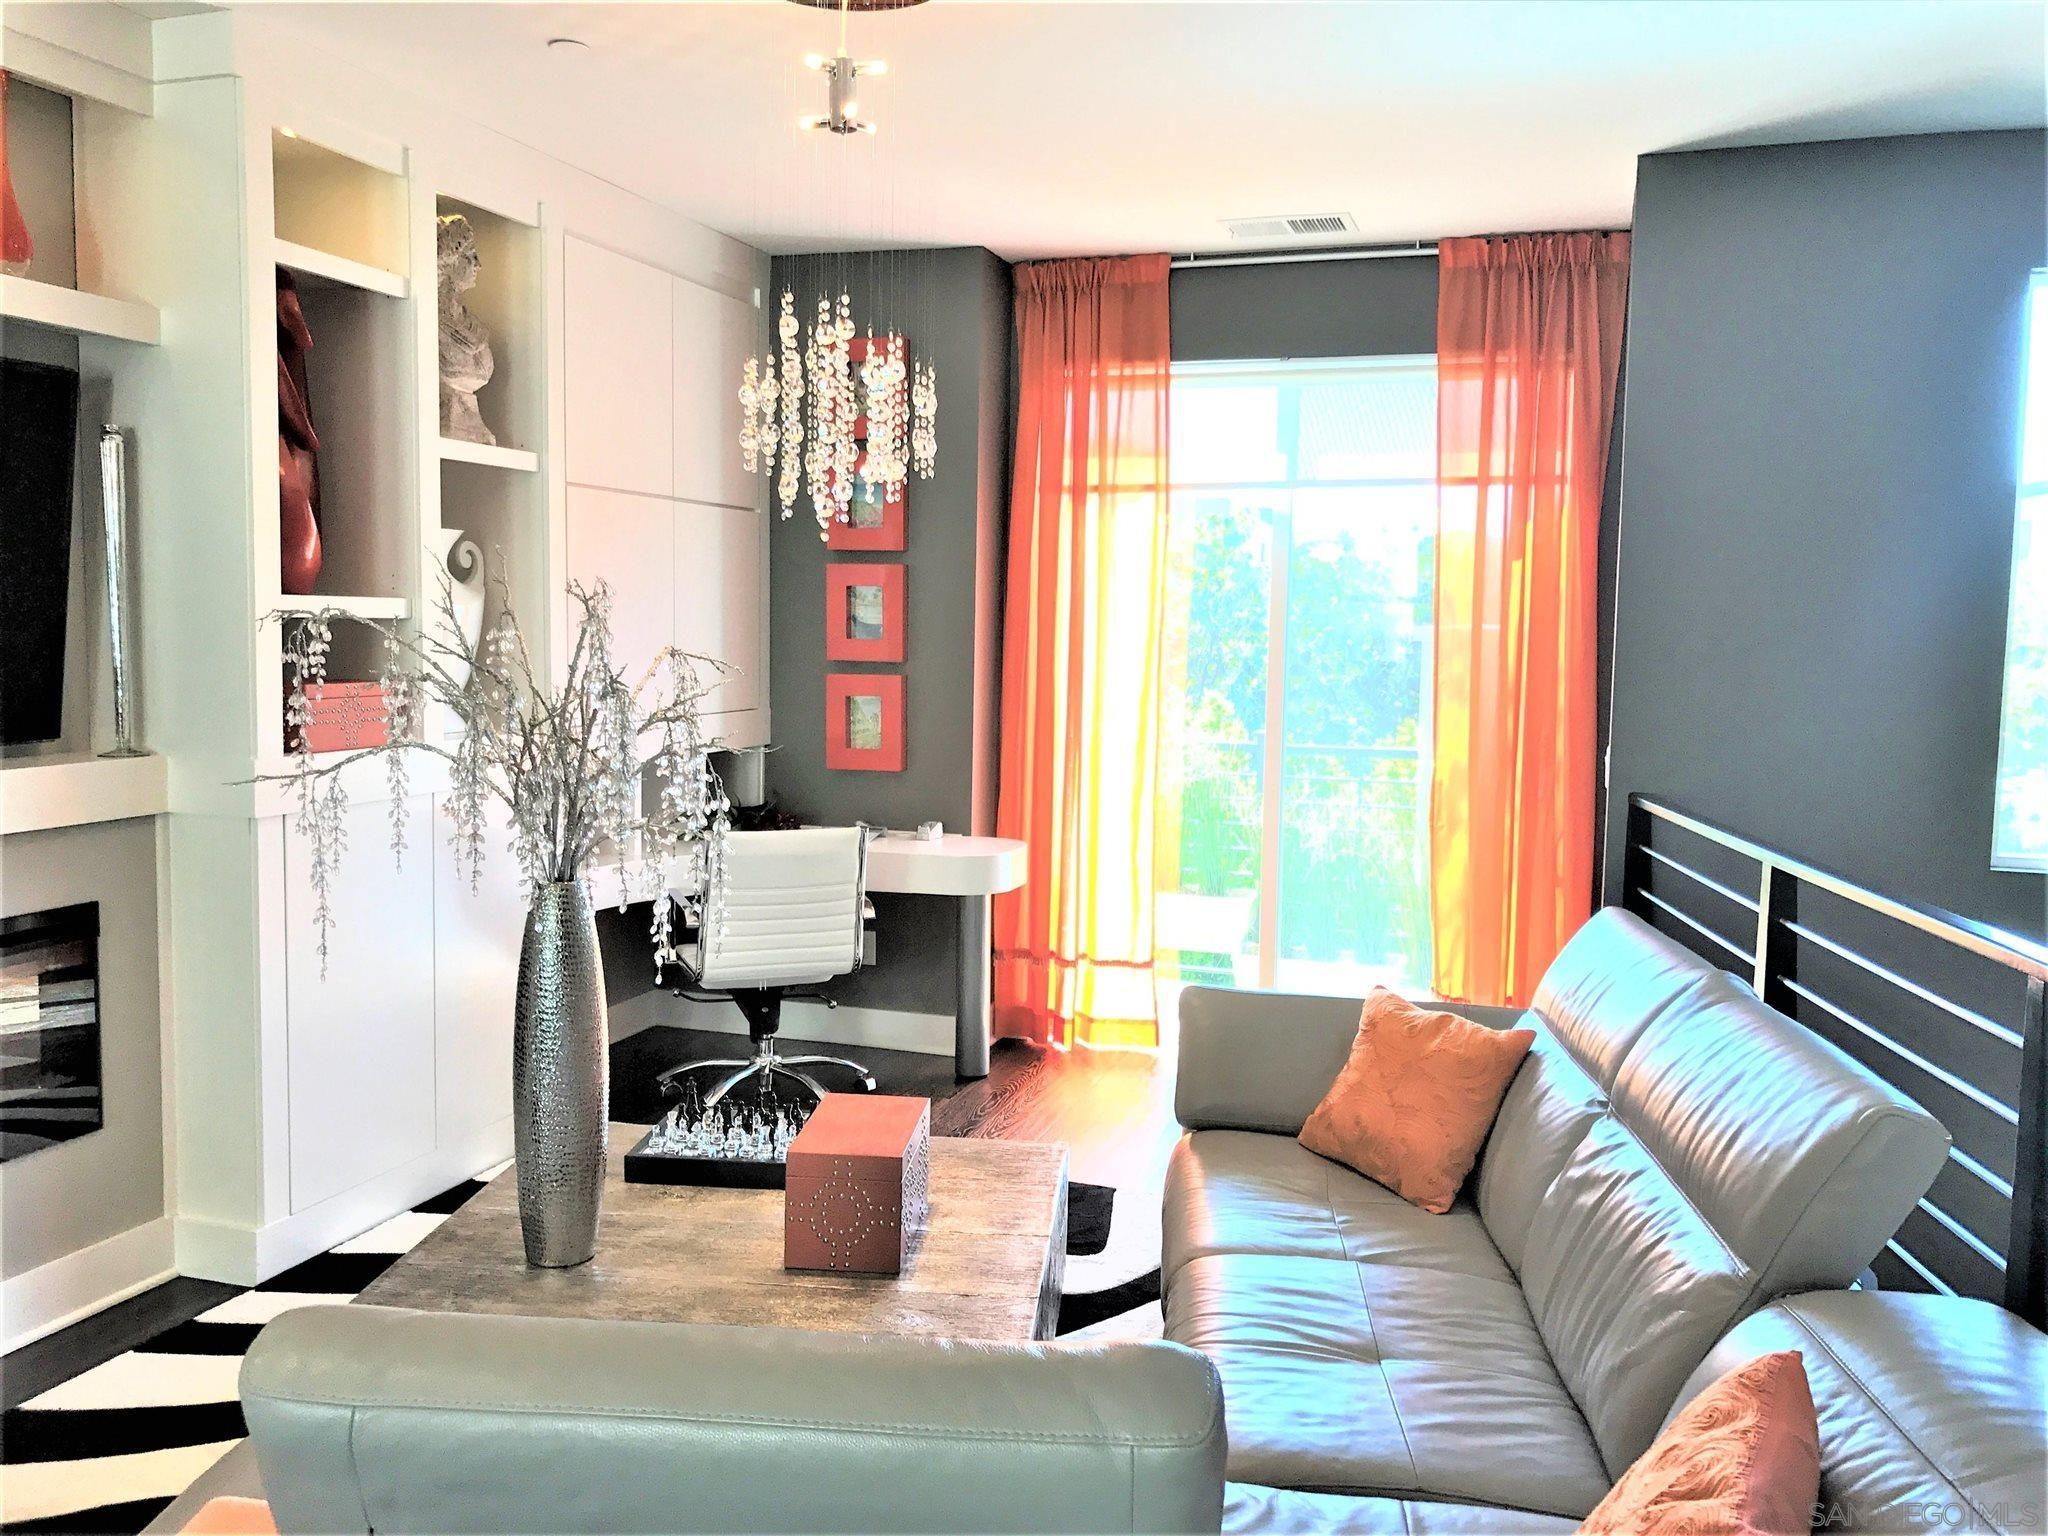 Main Photo: MISSION VALLEY Condo for sale : 3 bedrooms : 7870 Civita Blvd. in San Diego